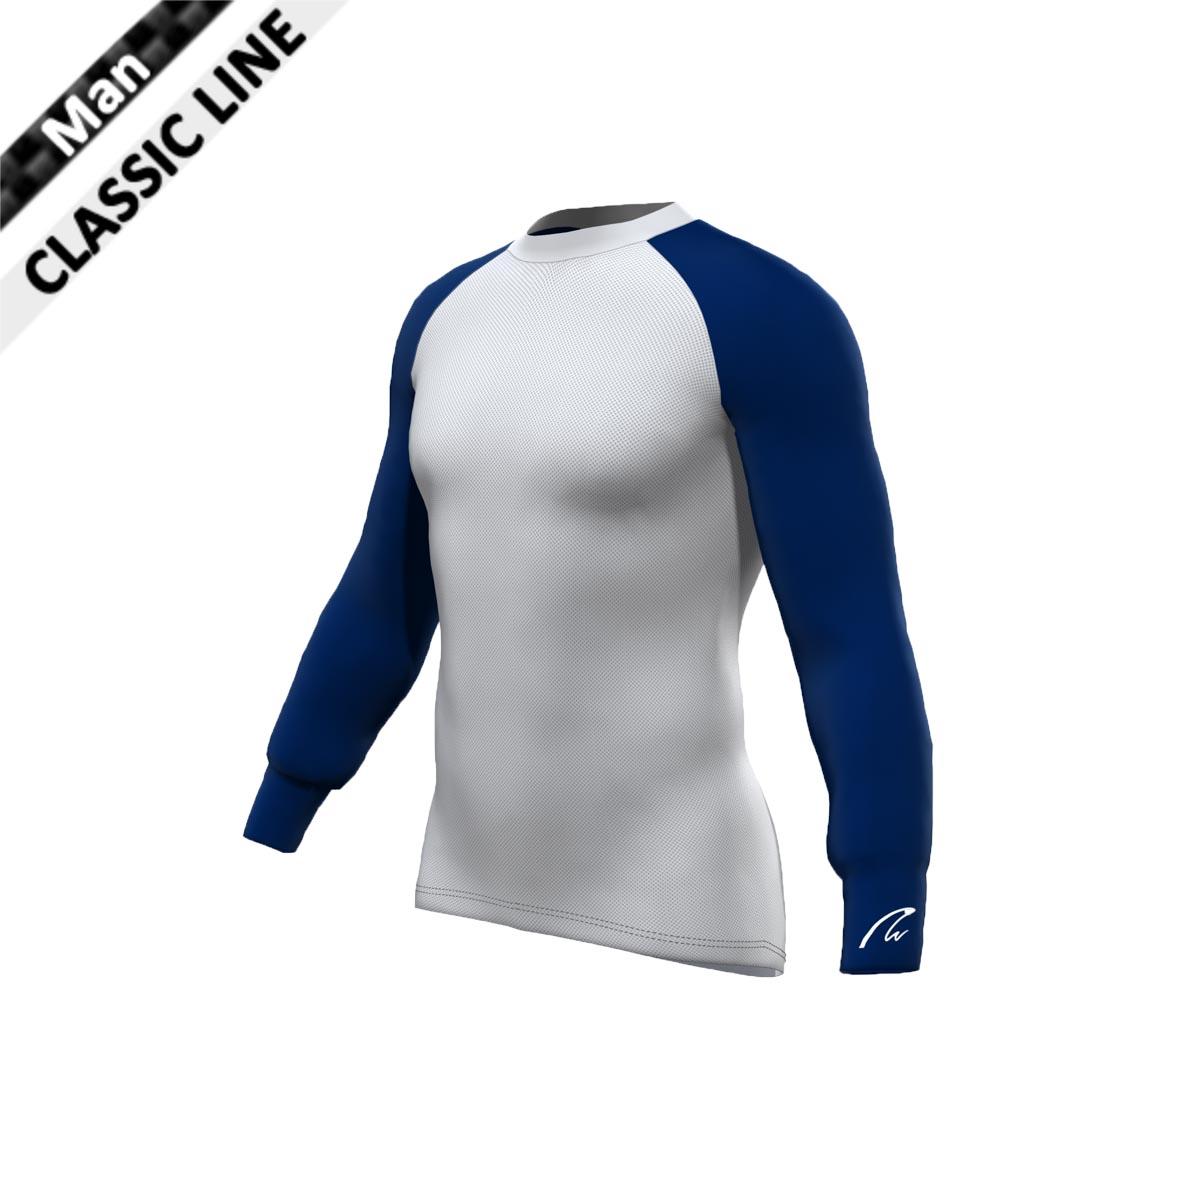 Mesh Gamex - Man Longsleeve marine blau